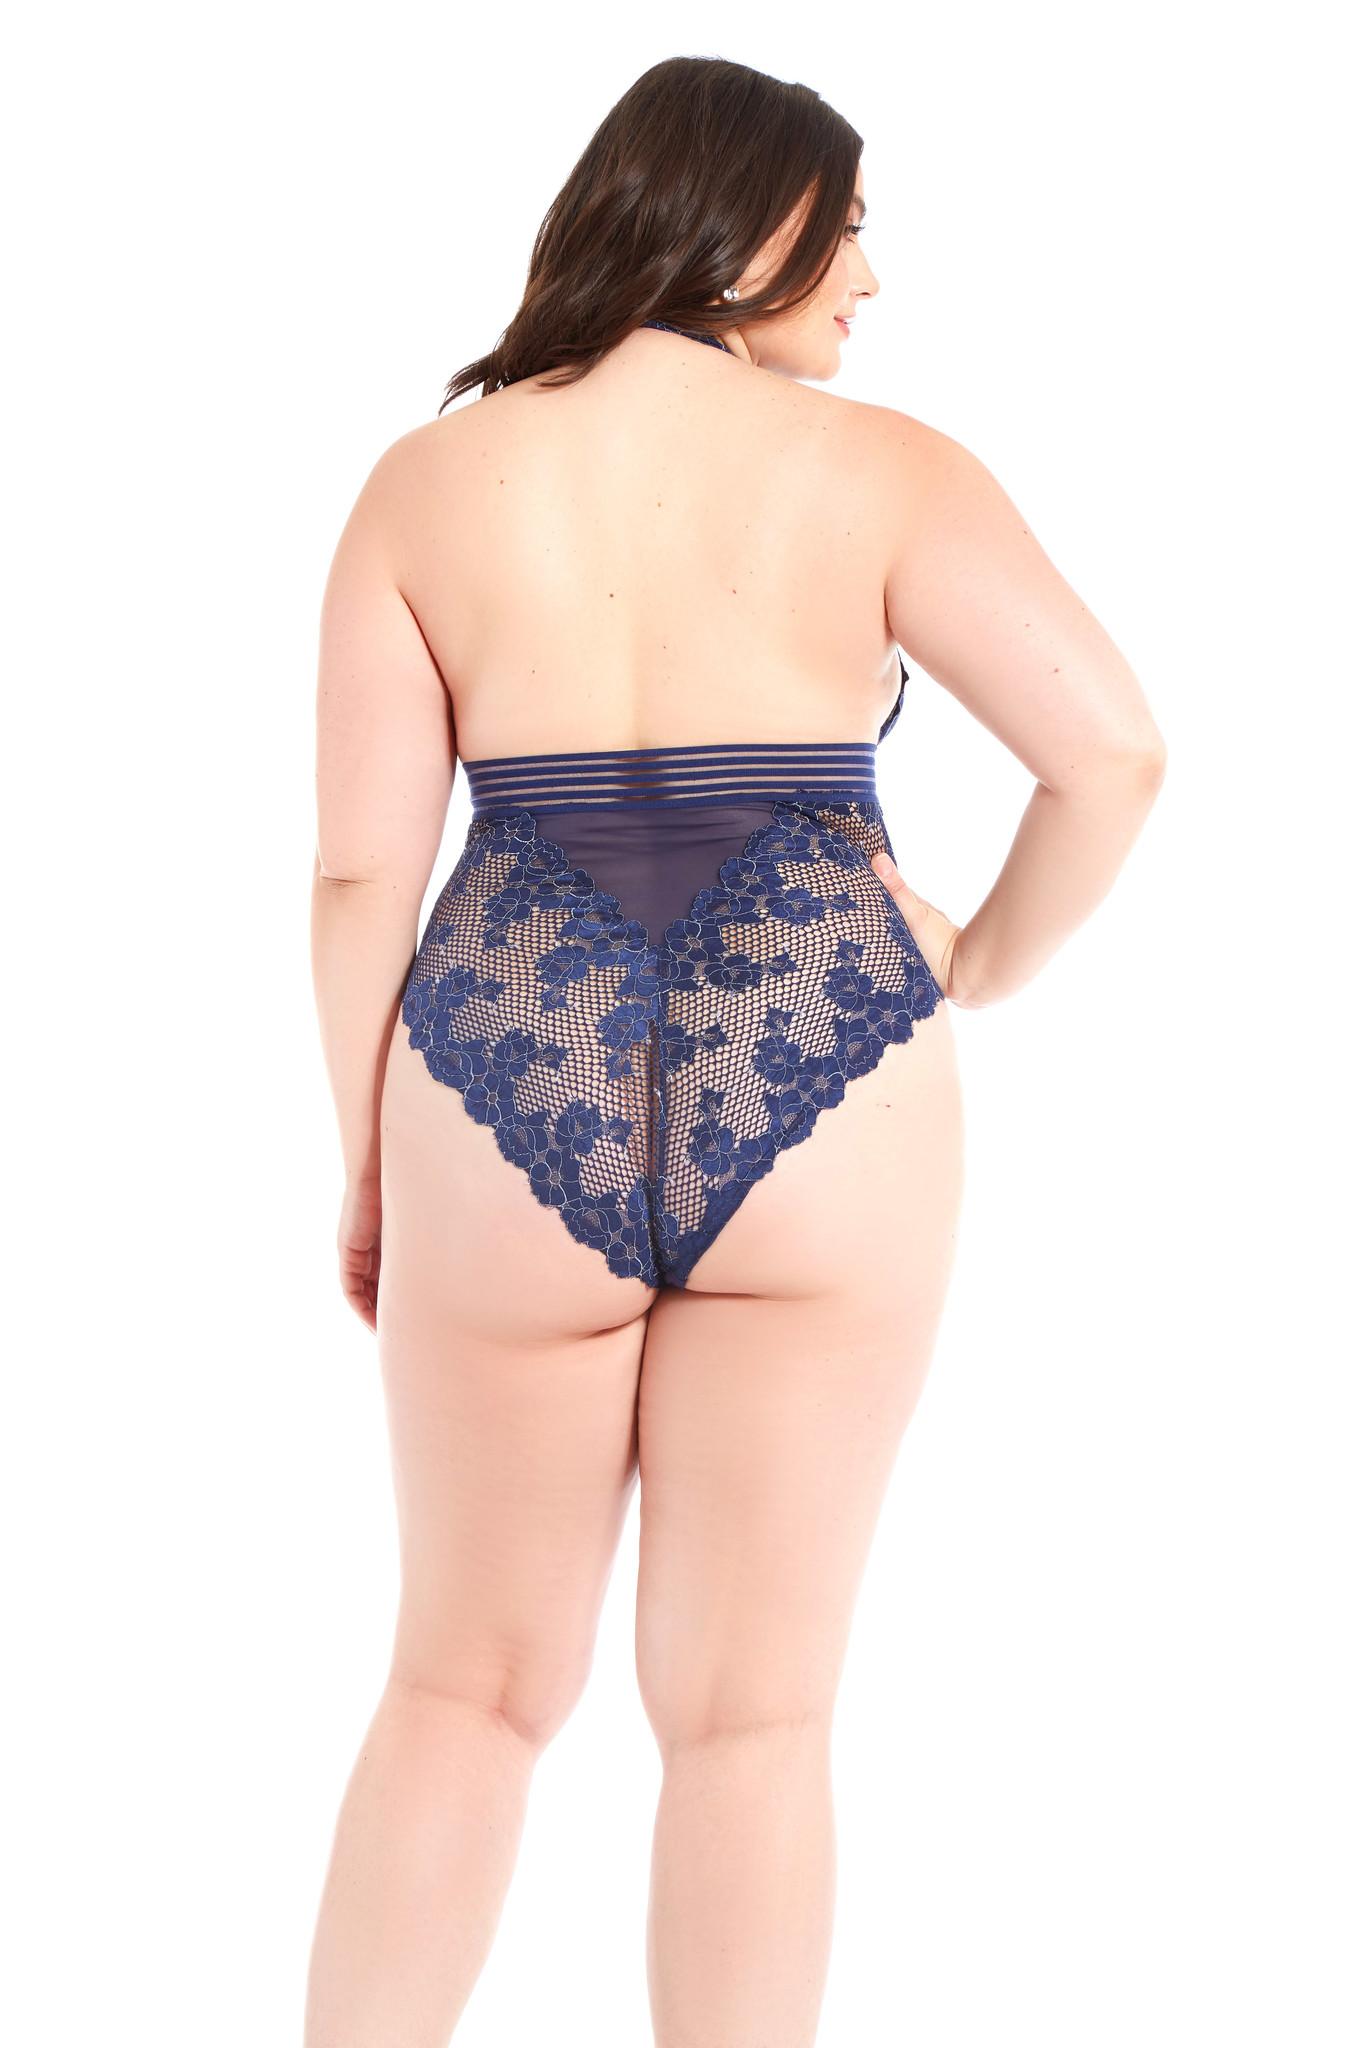 ed3ceb67a53 Plus Size Blue Floral Fishnet Teddy - ANGIE DAVIS